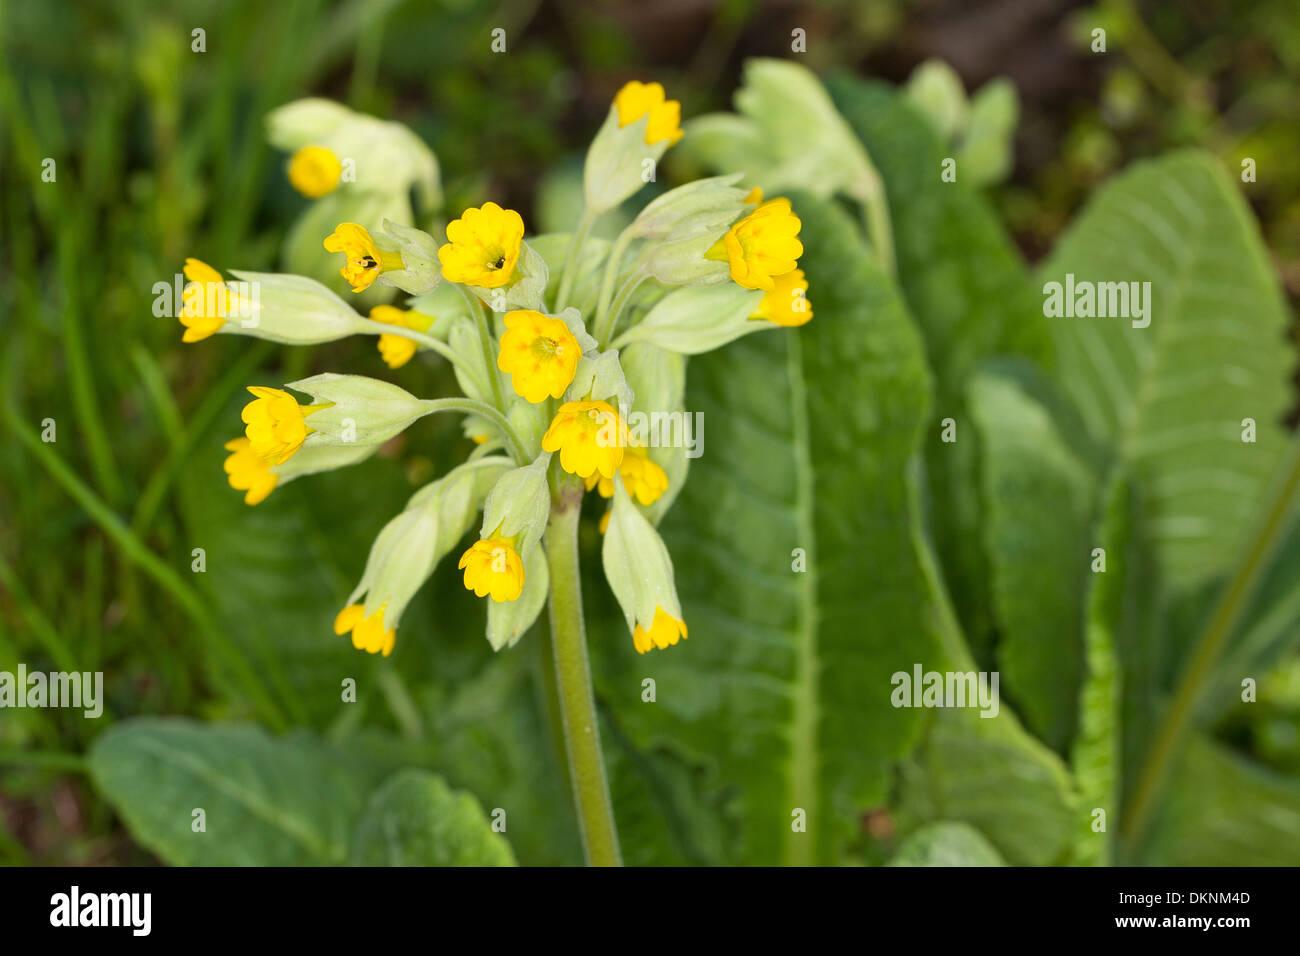 Cowslip, key flower, key of heaven, fairy cups, Echte Schlüsselblume, Wiesen-Schlüsselblume, Primel, Primula veris - Stock Image